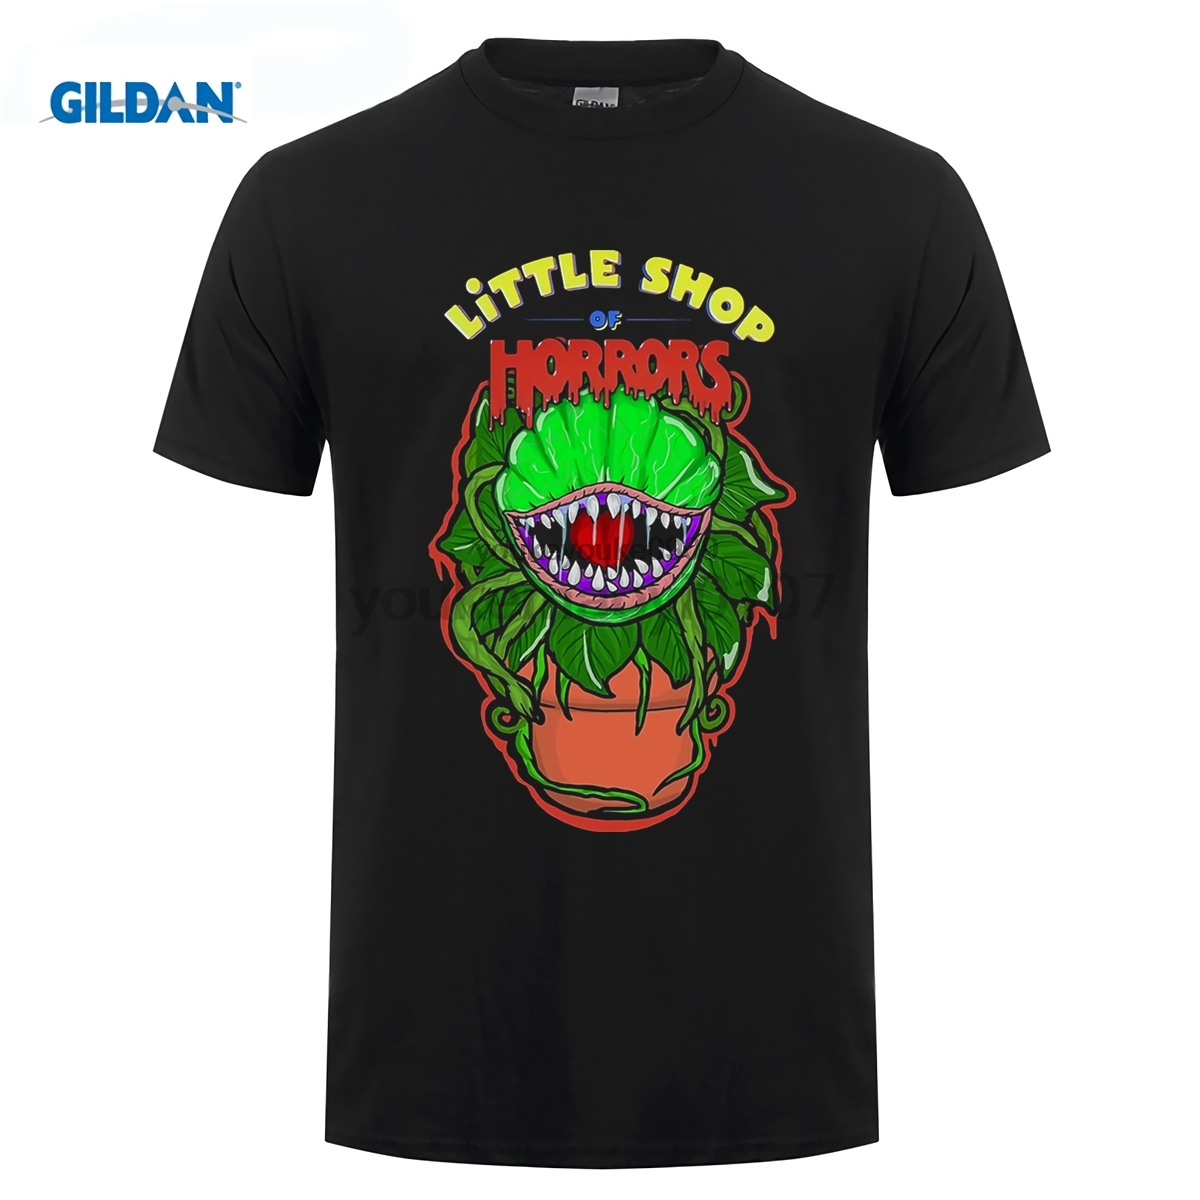 GILDAN LITTLE SHOP OF HORRORS T SHIRT TOP CULT FILM MOVIE 1980S FAN HORROR SCI FI Hot Sale Super Fashion O-Neck T-Shirt